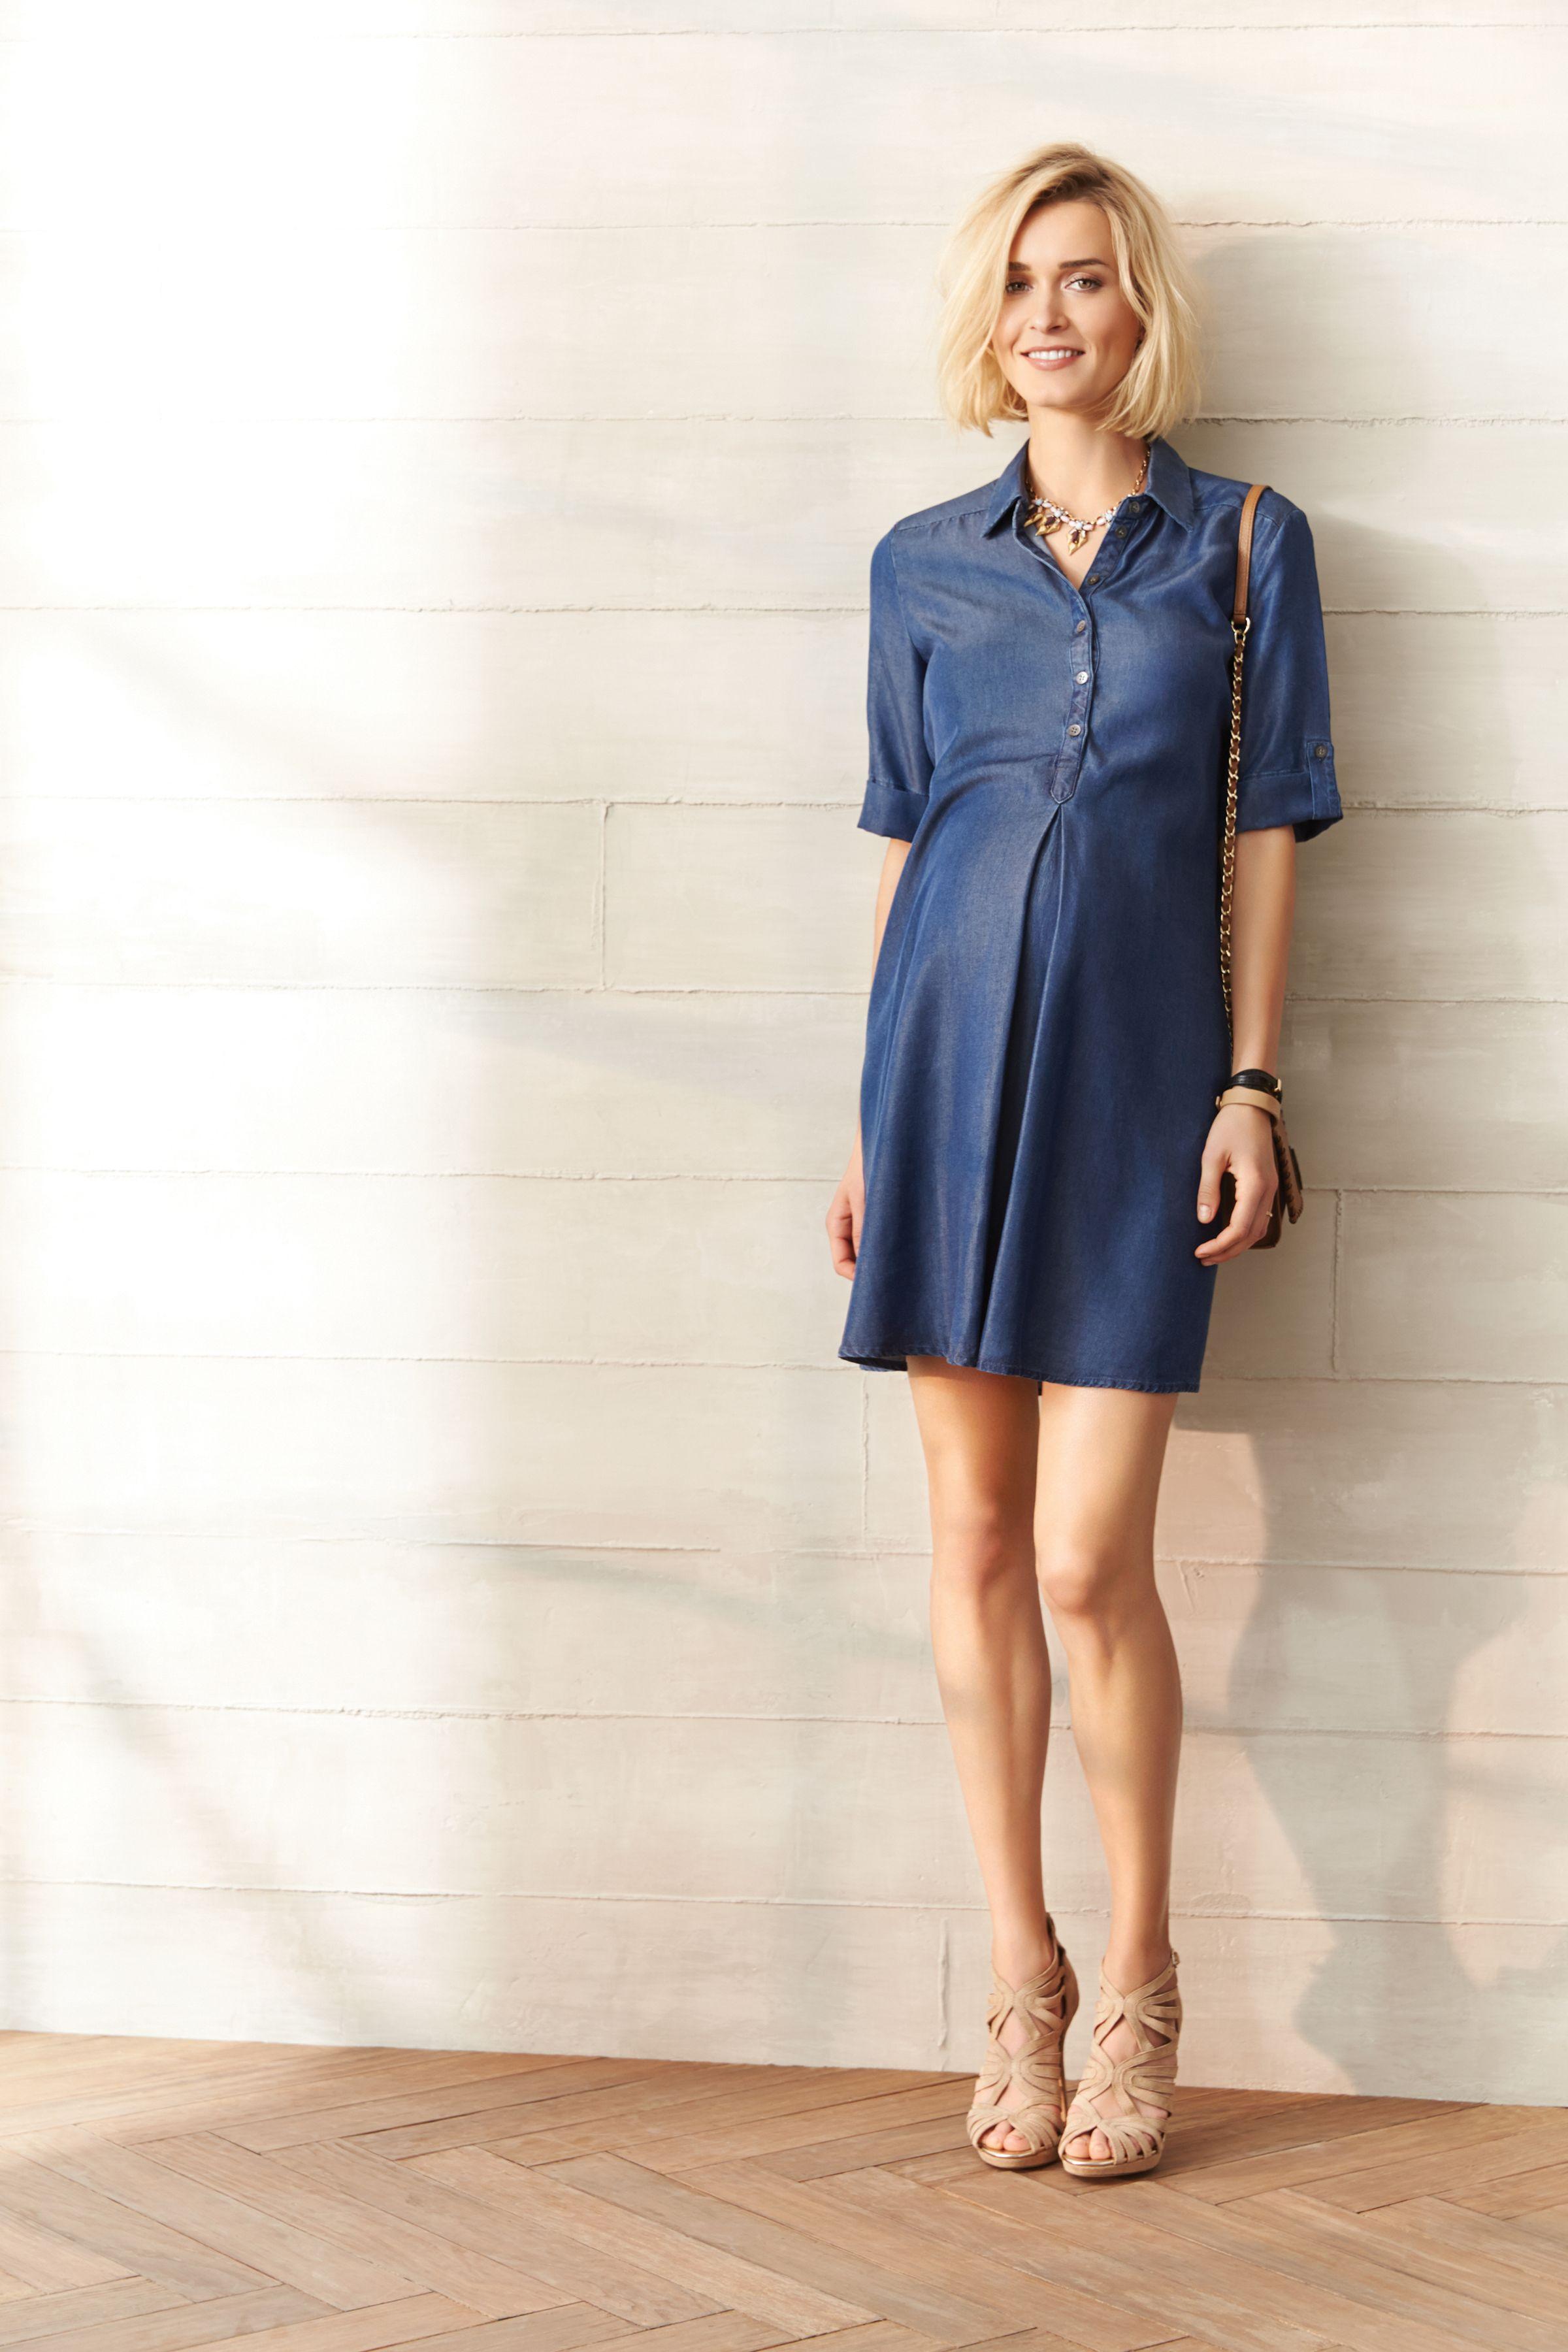 8eefb89ebfce The Designer Dress   Bump to Be   Maternity Fashion, Fashion ...